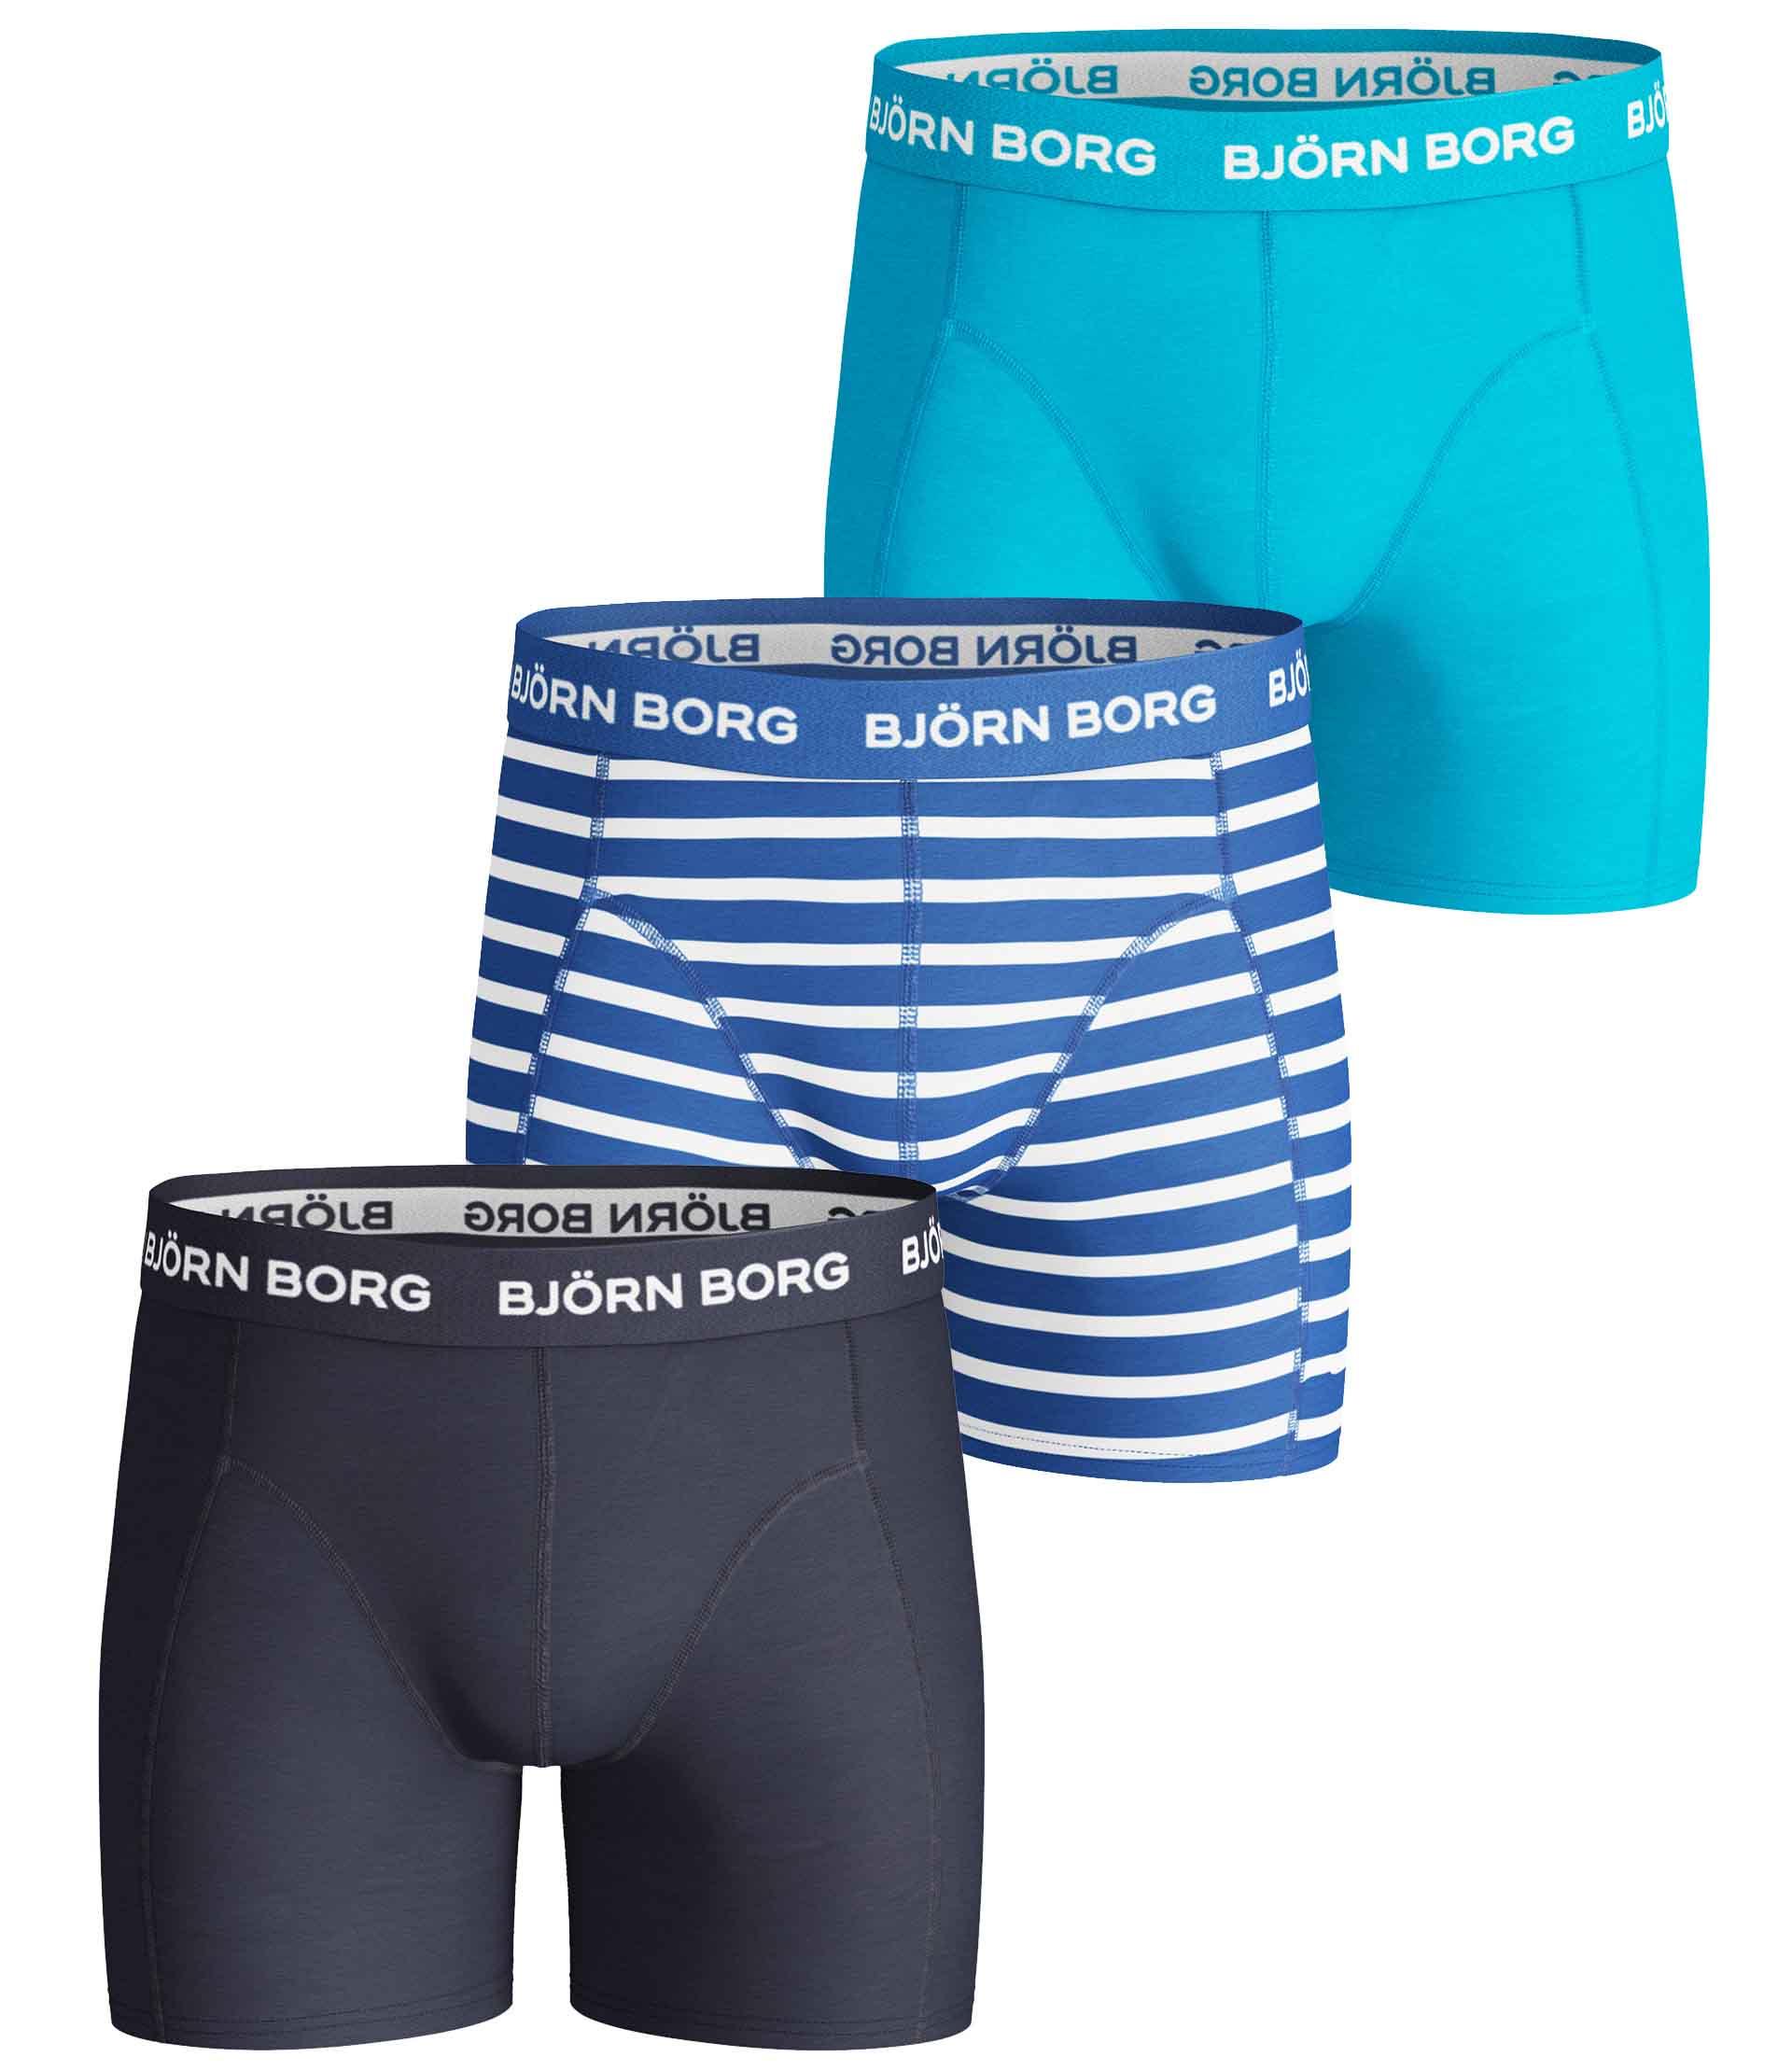 Bjorn Borg boxers